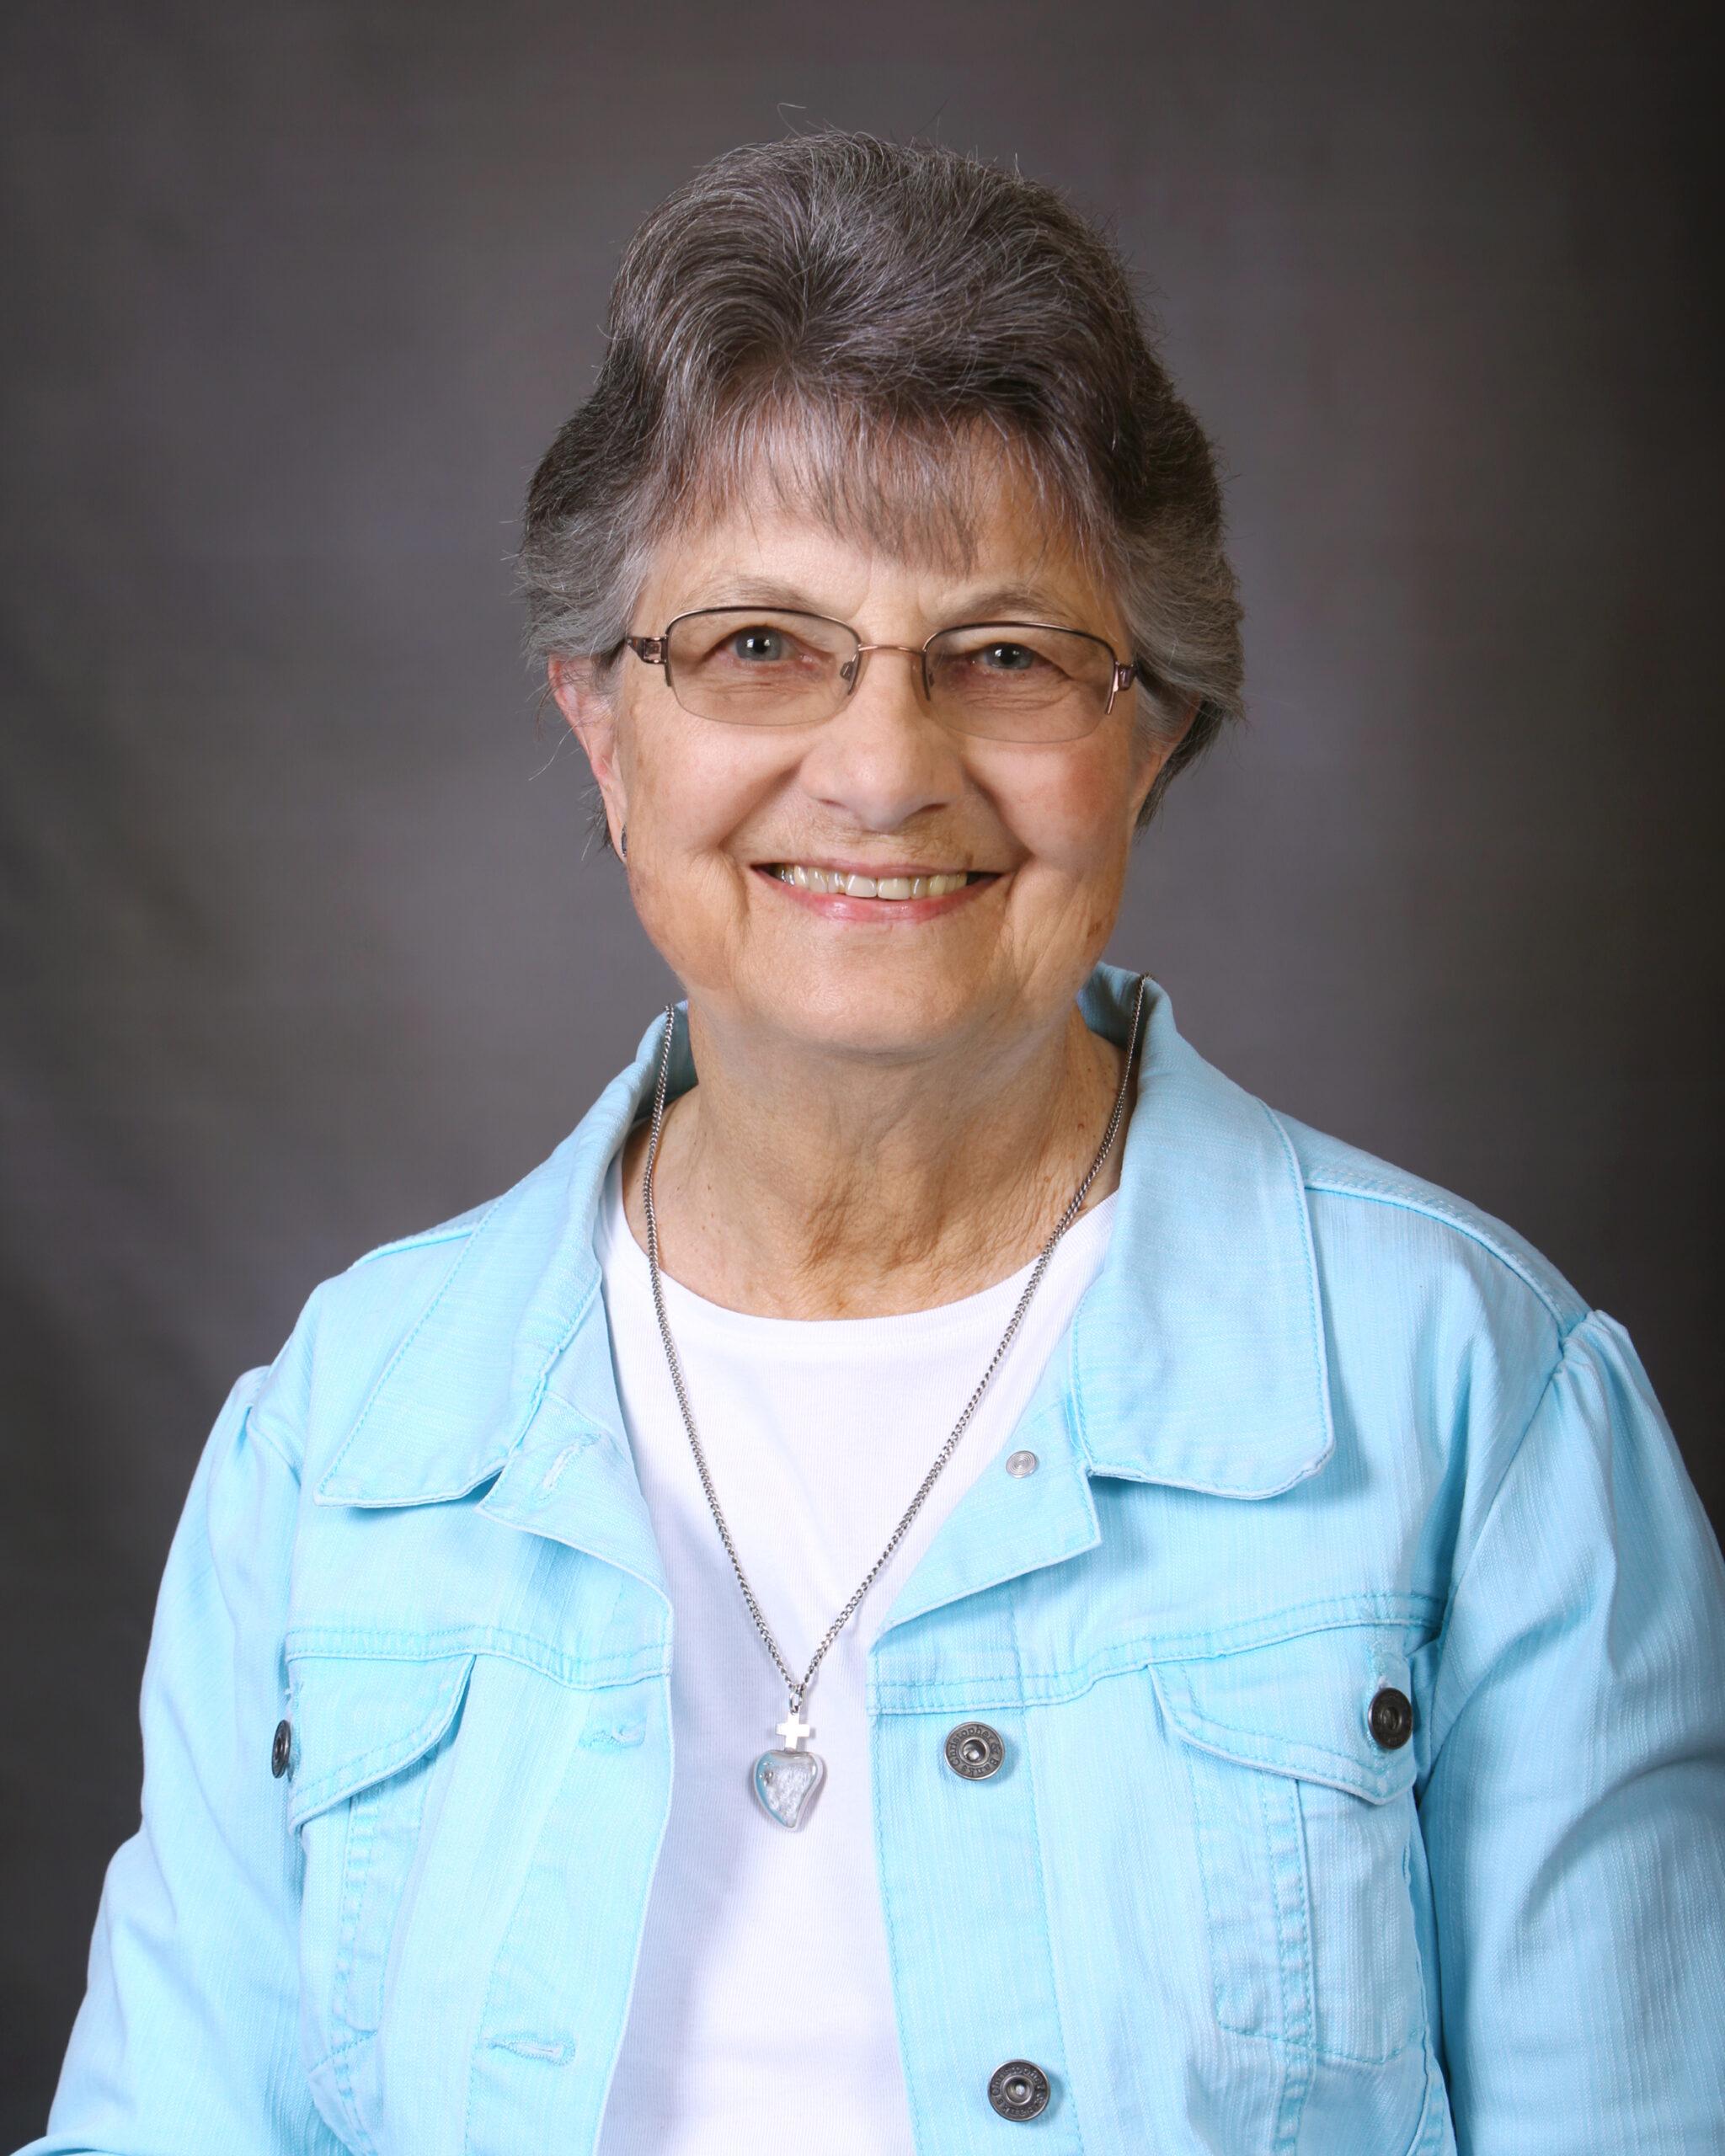 Sister Elaine Freund, ASC